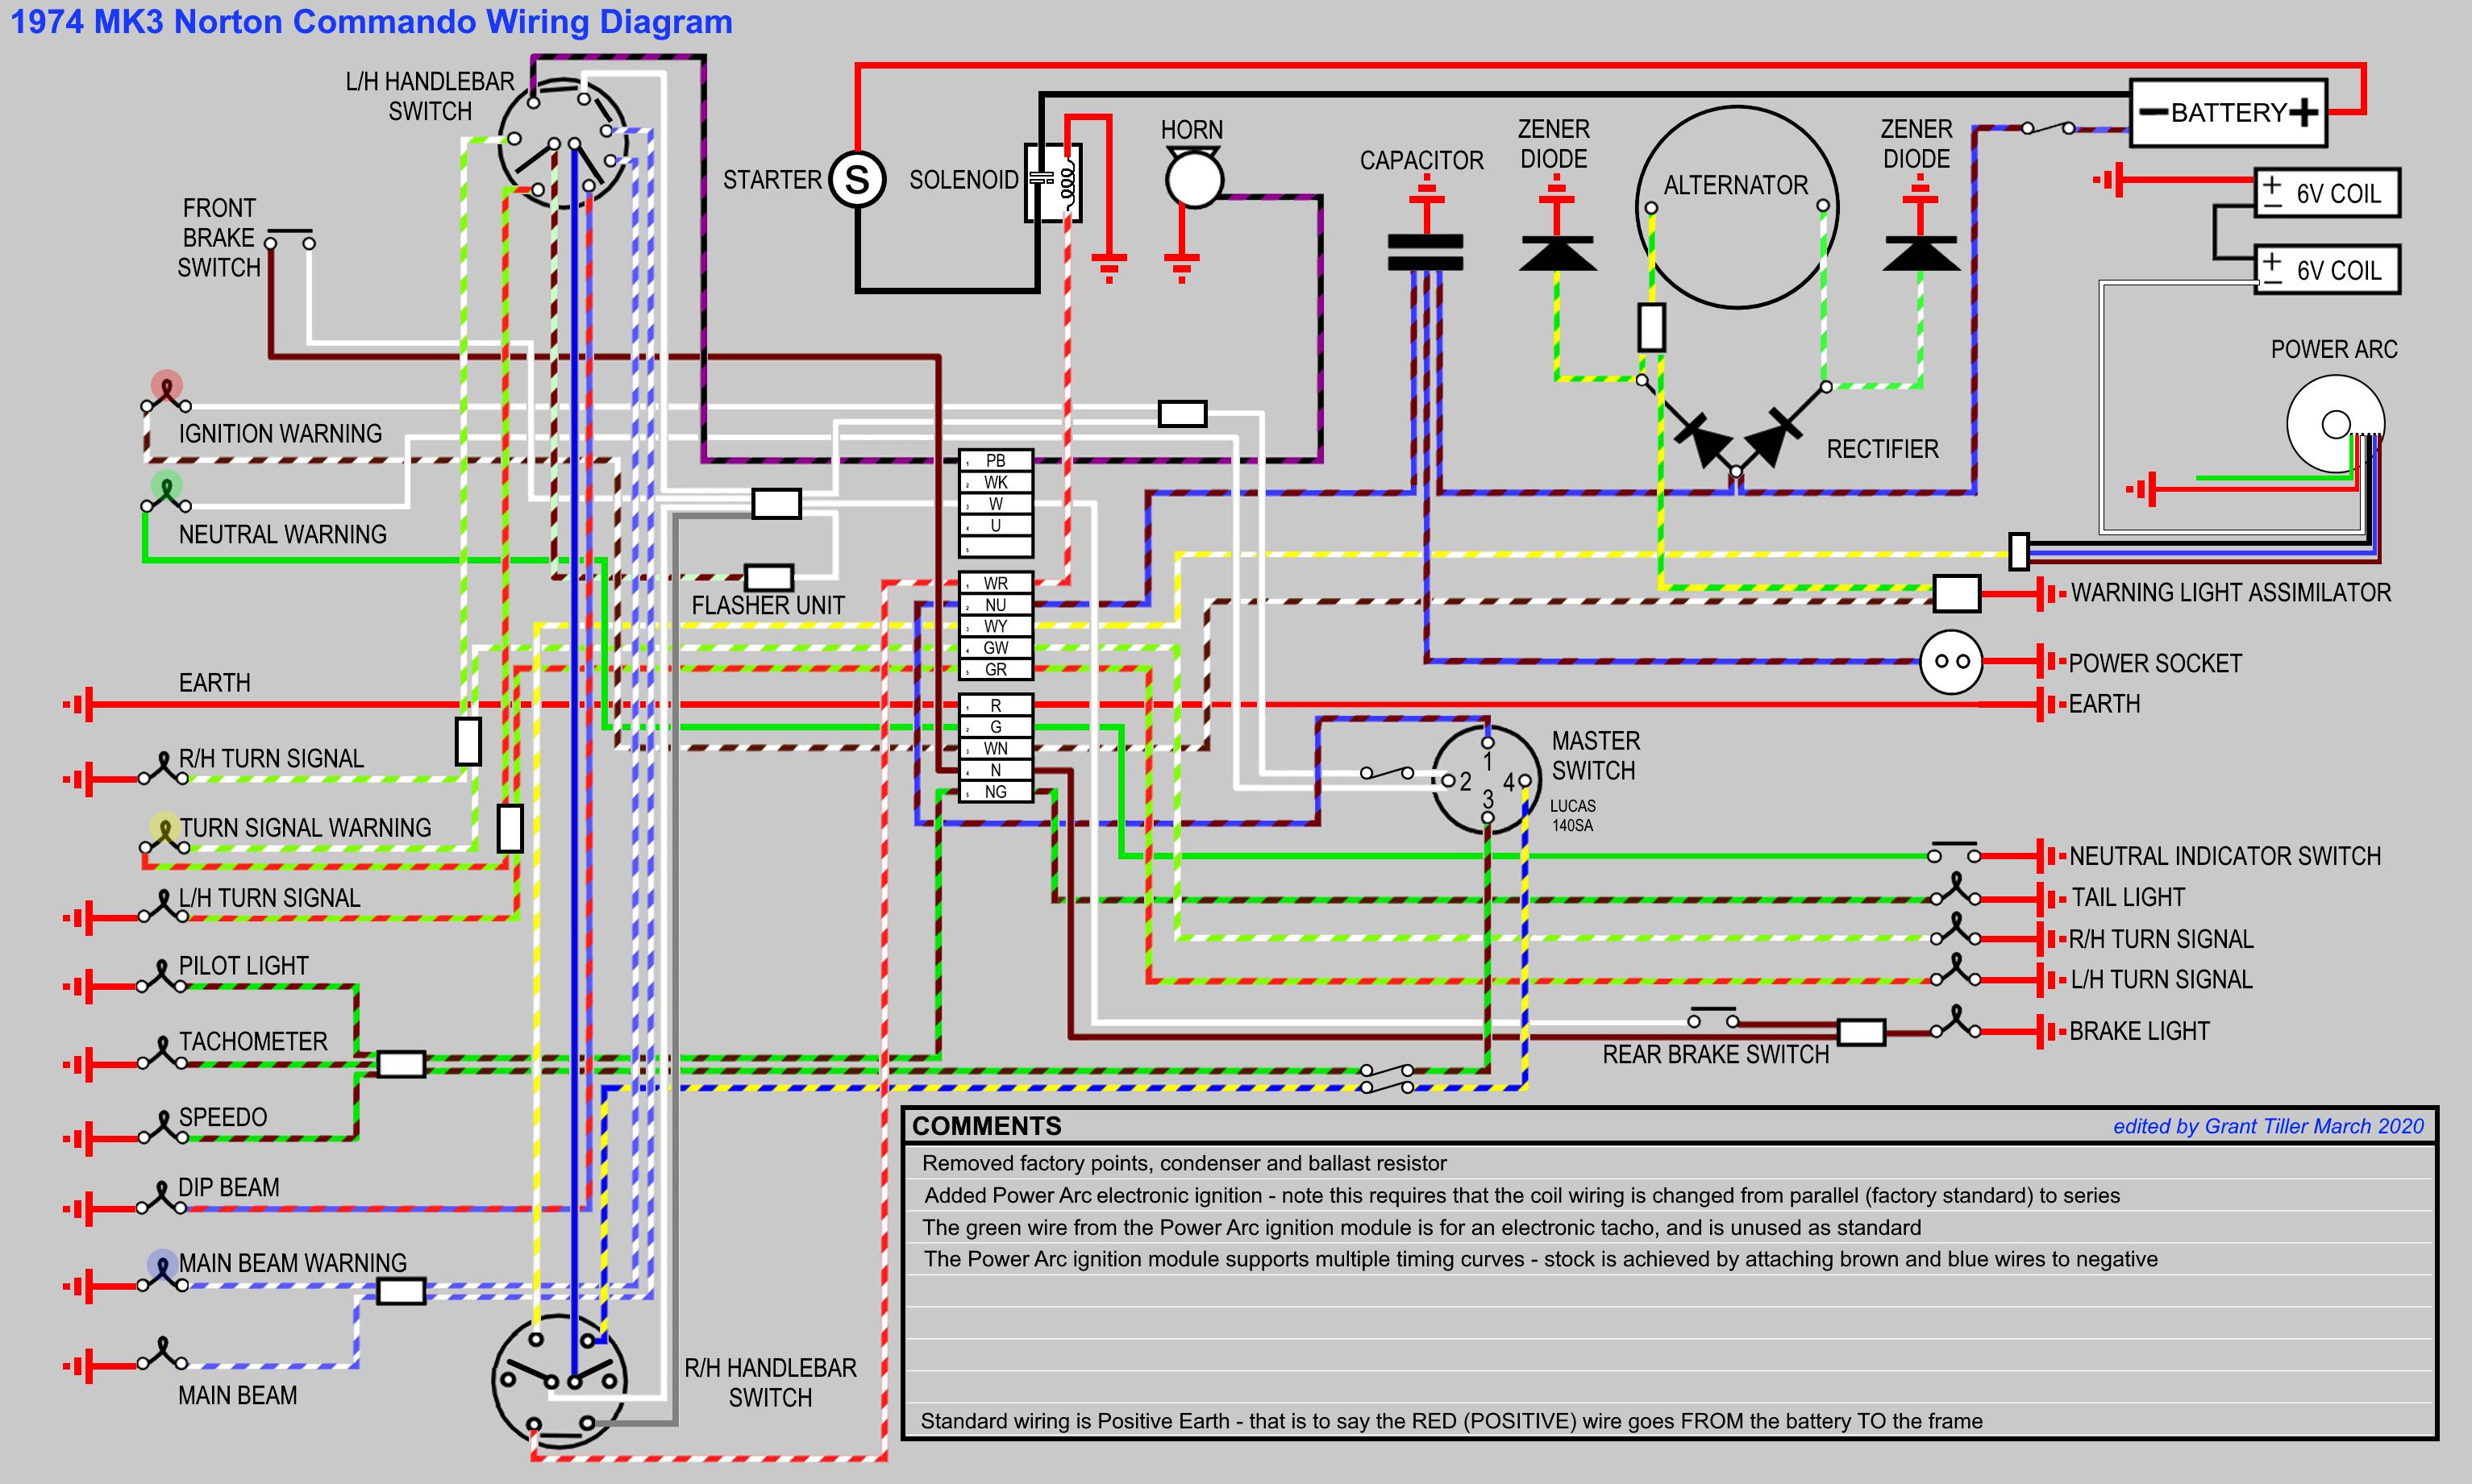 Zanotti Gm Wiring Diagram Camaro Engine Block Diagram Stereoa Yenpancane Jeanjaures37 Fr